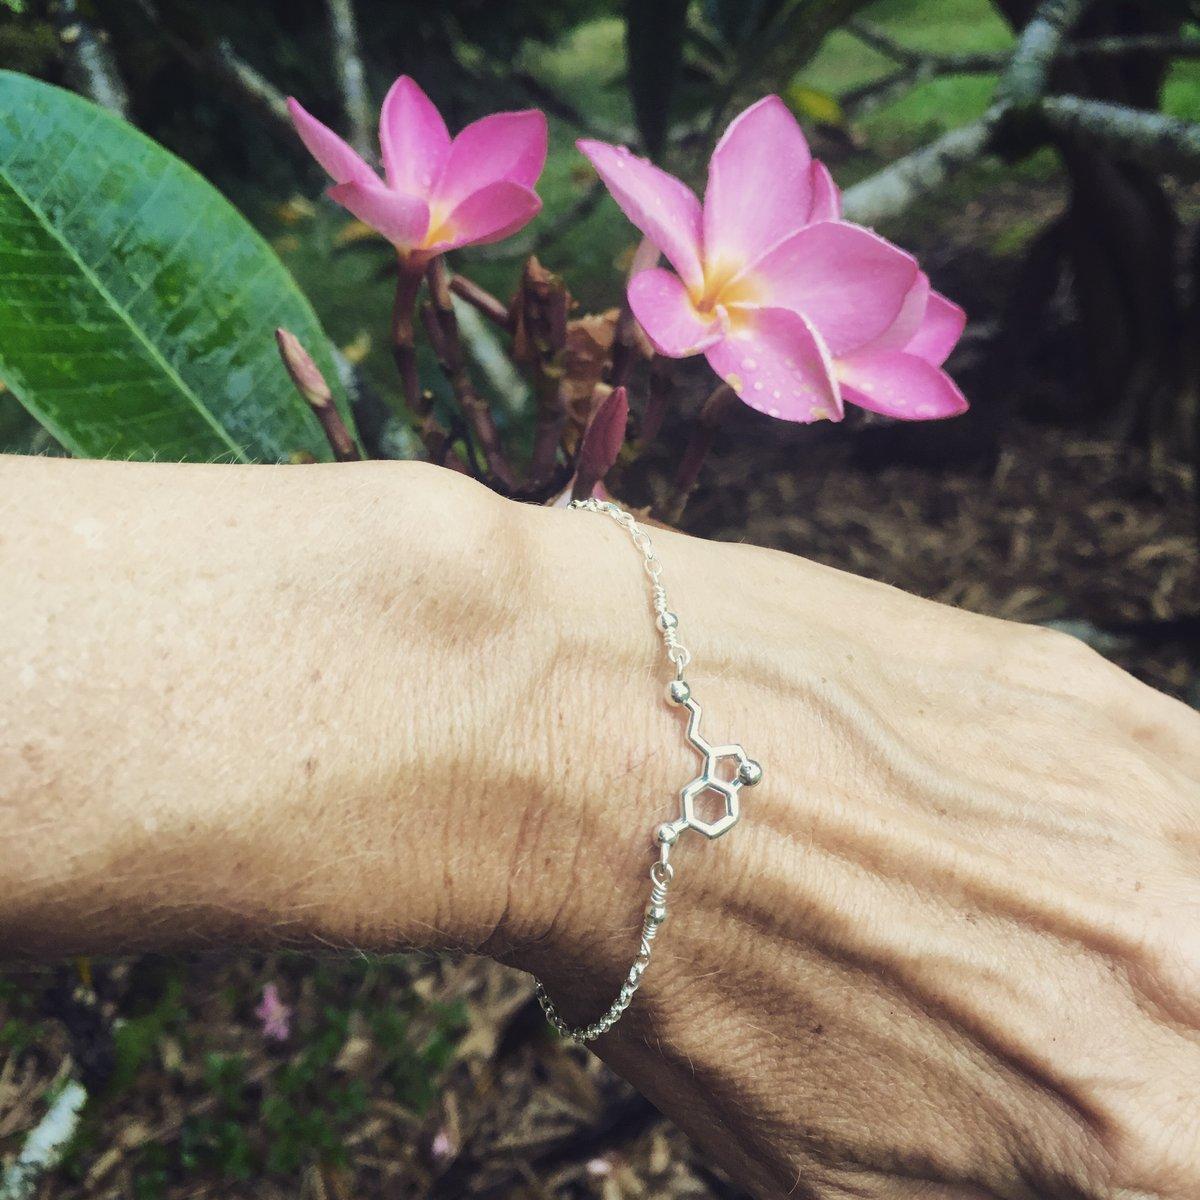 Image of molecule bracelet